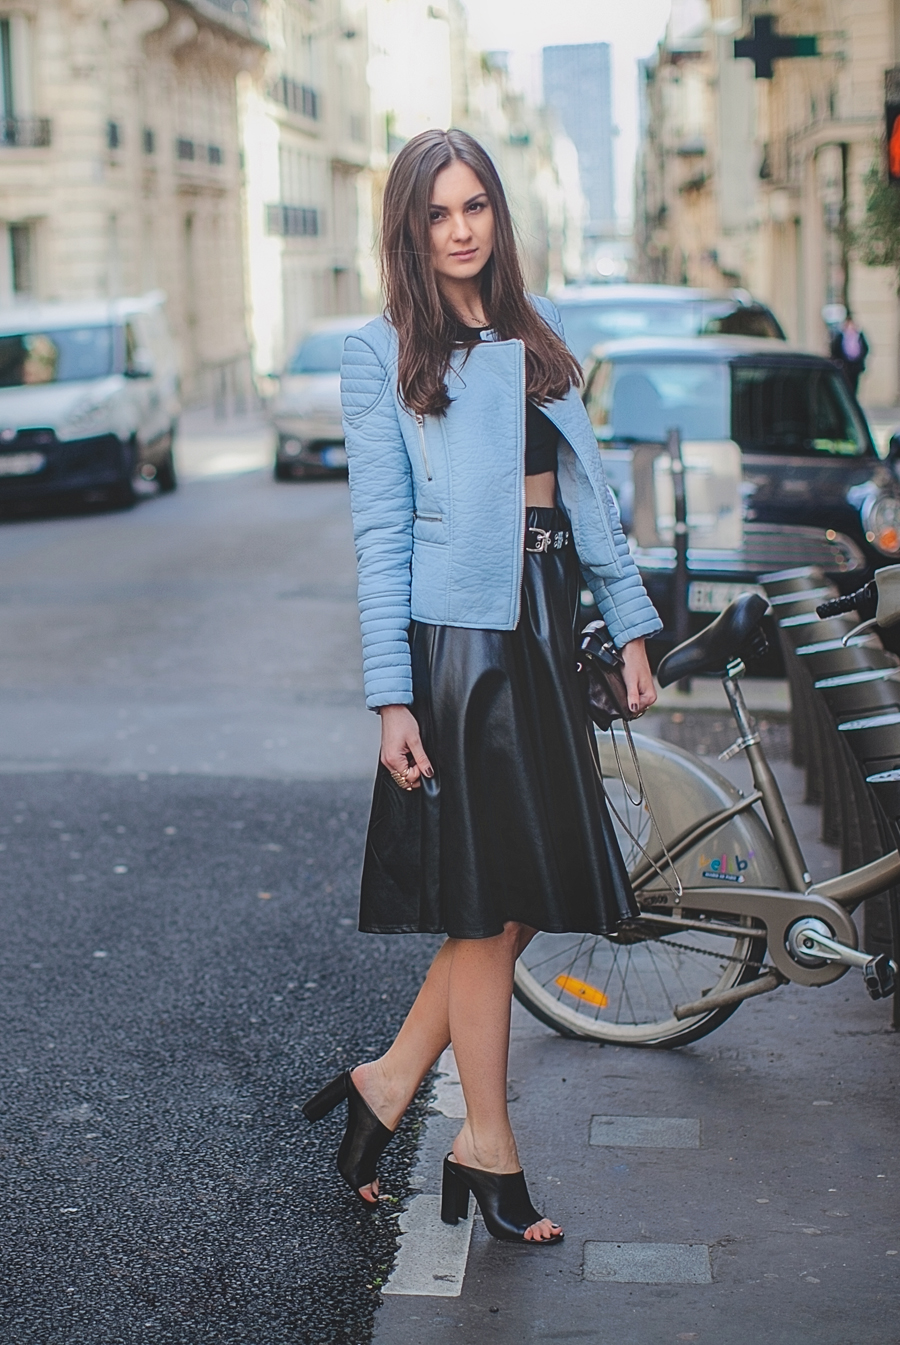 fashion_personal_street_style_blogger_nika_huk_pastel_blue_biker_jacket_Leather_mules